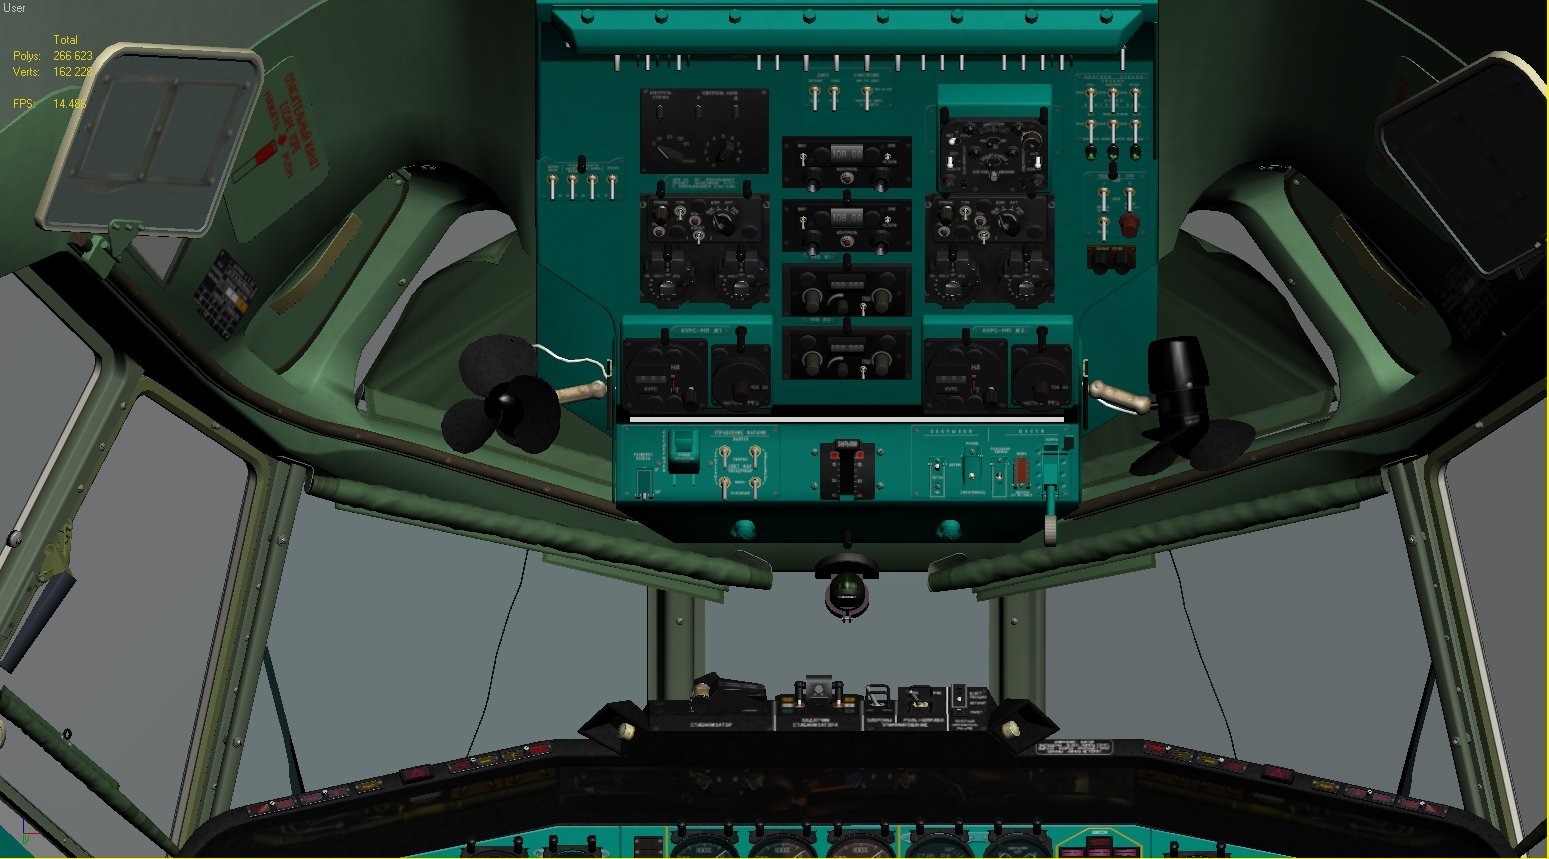 1310473507_2019-04-2001_42_35-Tu-154_B2_VC487.max-ProjectFolder_D__Documents_3dsmax-Autodesk.jpg.57f6fe377caf404efc2257c13b4801a7.jpg